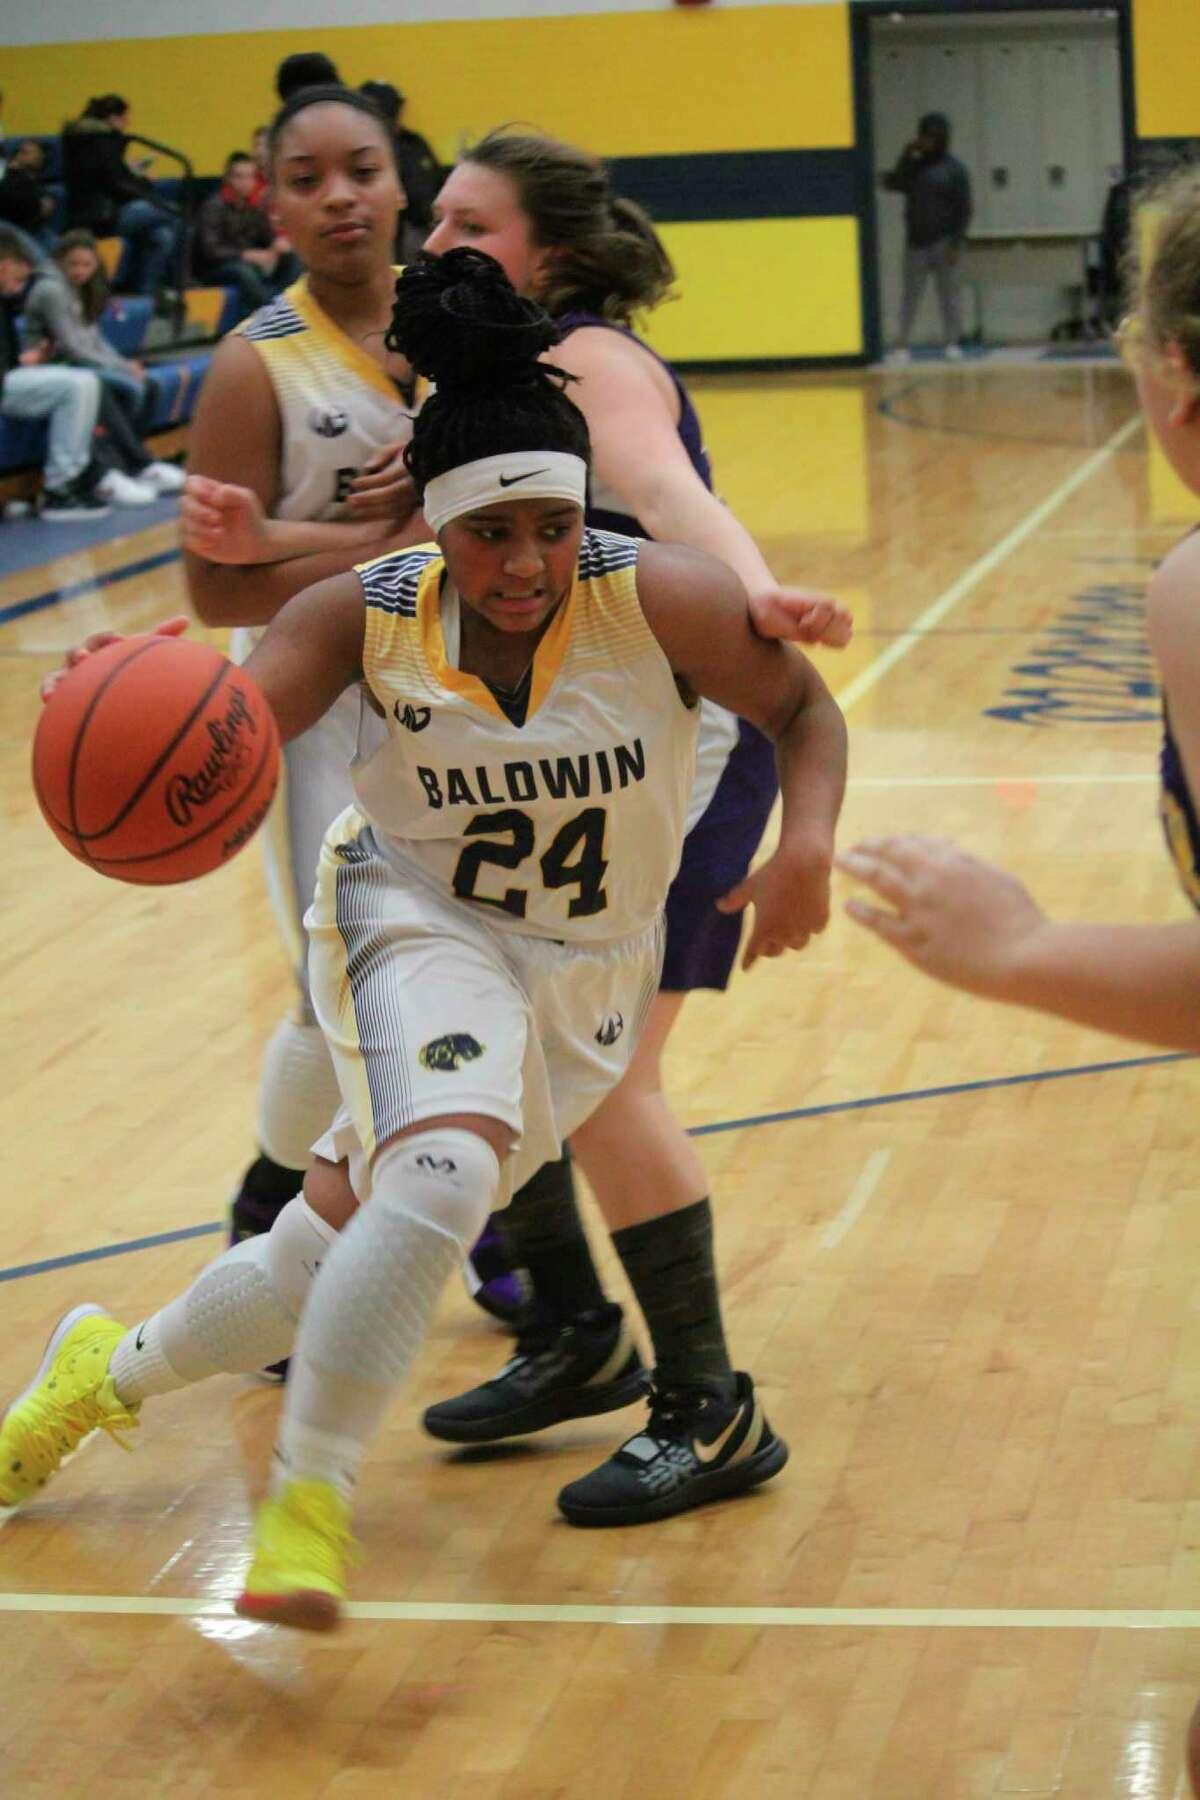 Baldwin's Cierra Pieske drives to the basket during action last season. (Star photo)